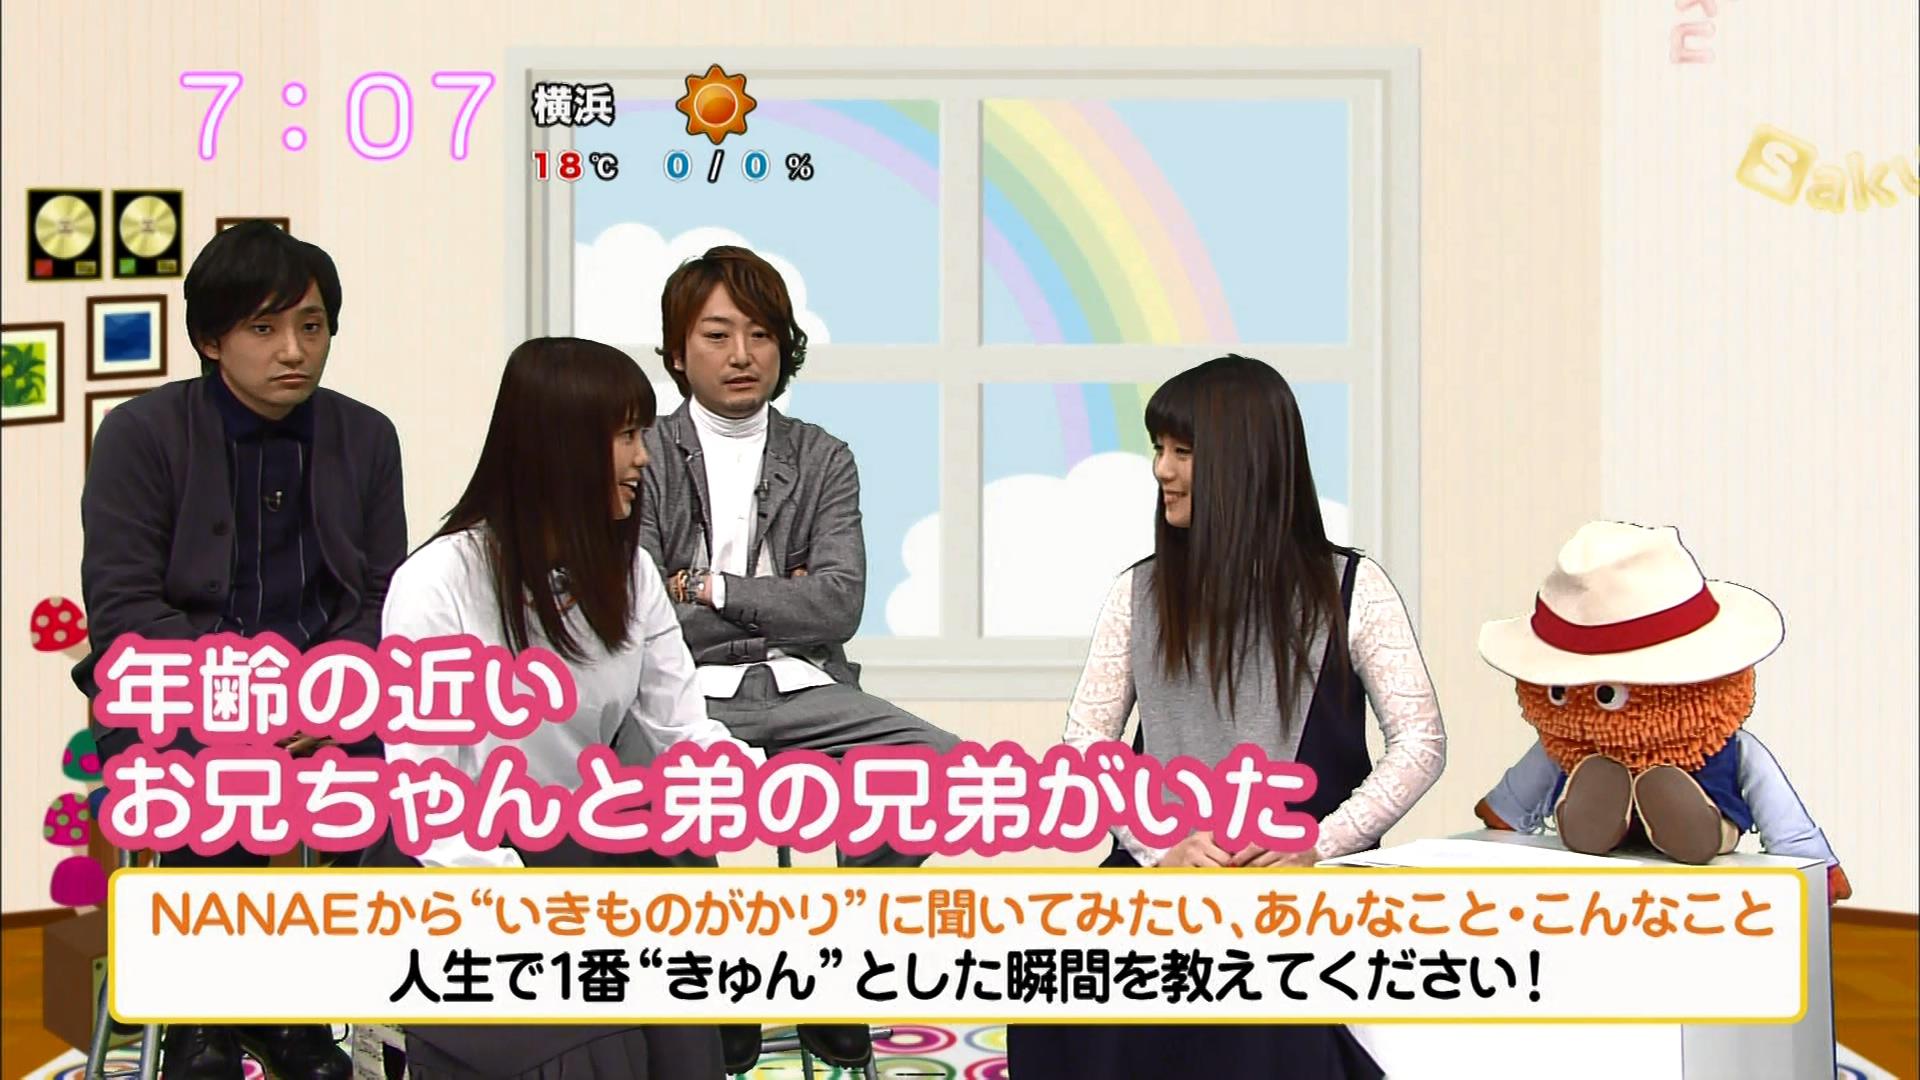 2016.03.17 いきものがかり(saku saku).ts_20160317_080100.835